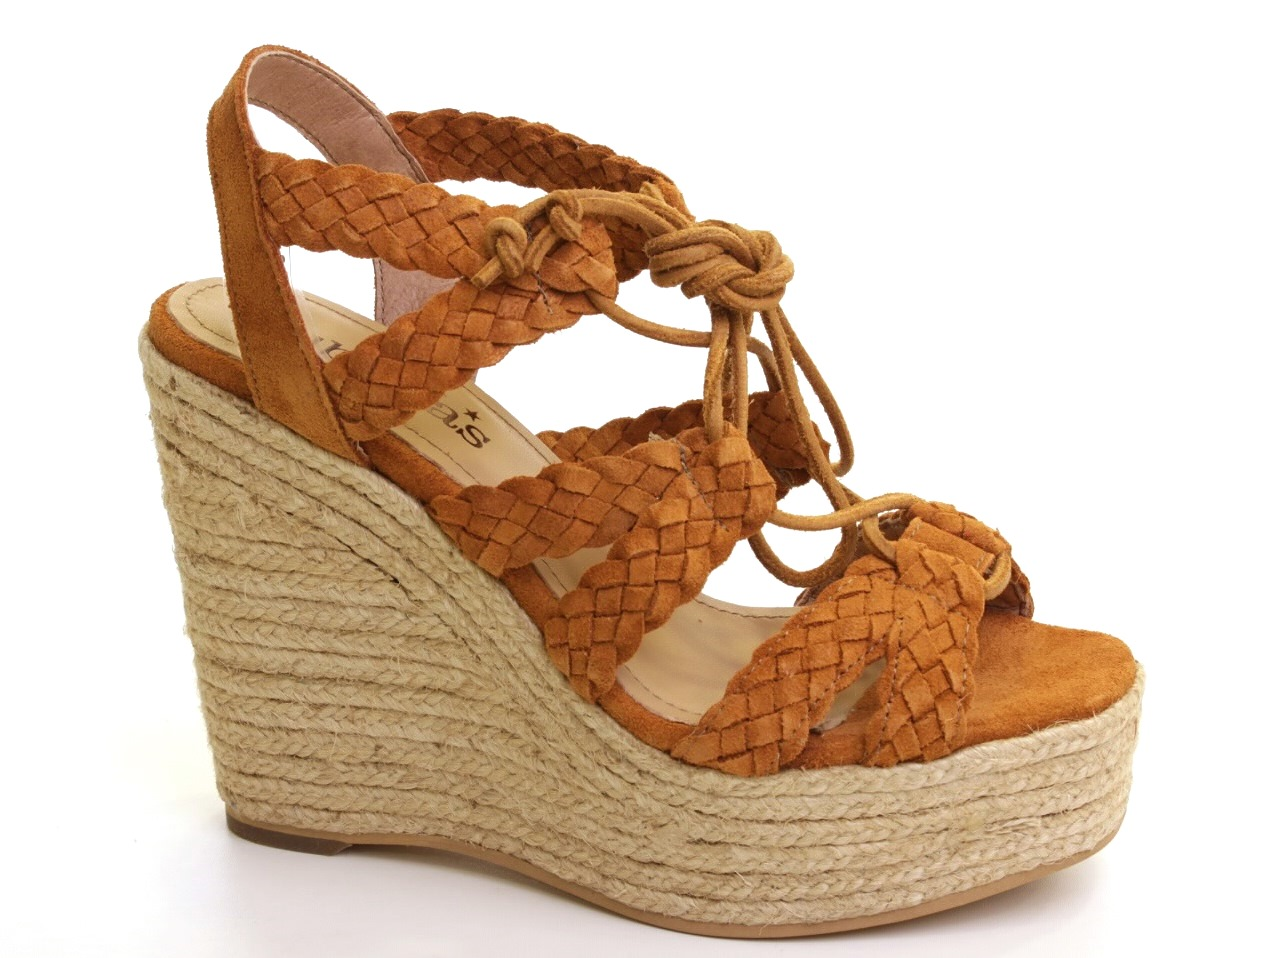 Wedge Sandals Cubanas - 334 LURA150